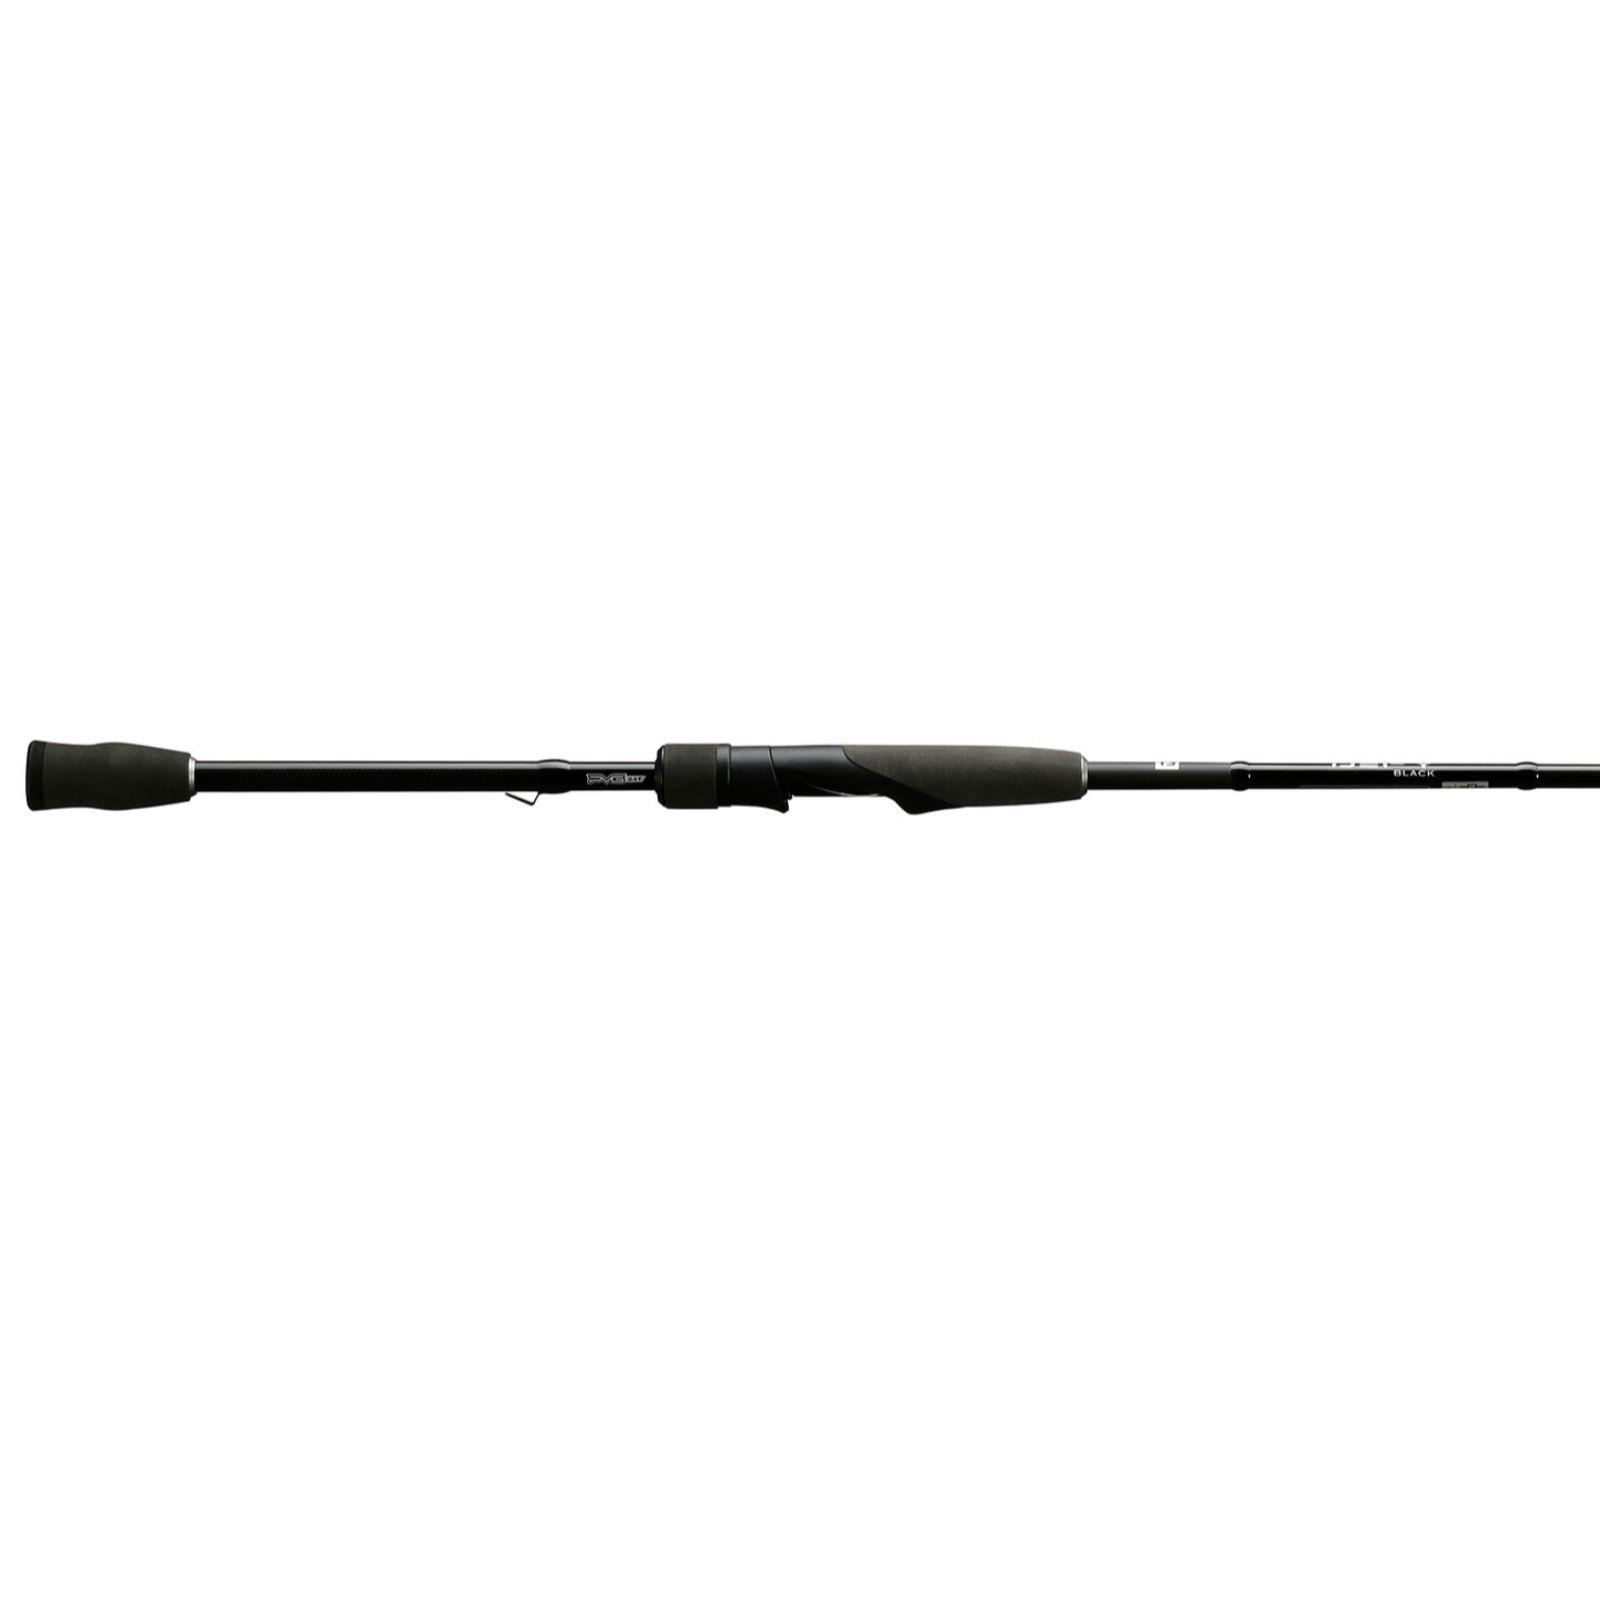 13 Fishing Defy Black 6ft 7in M Spinning Rod